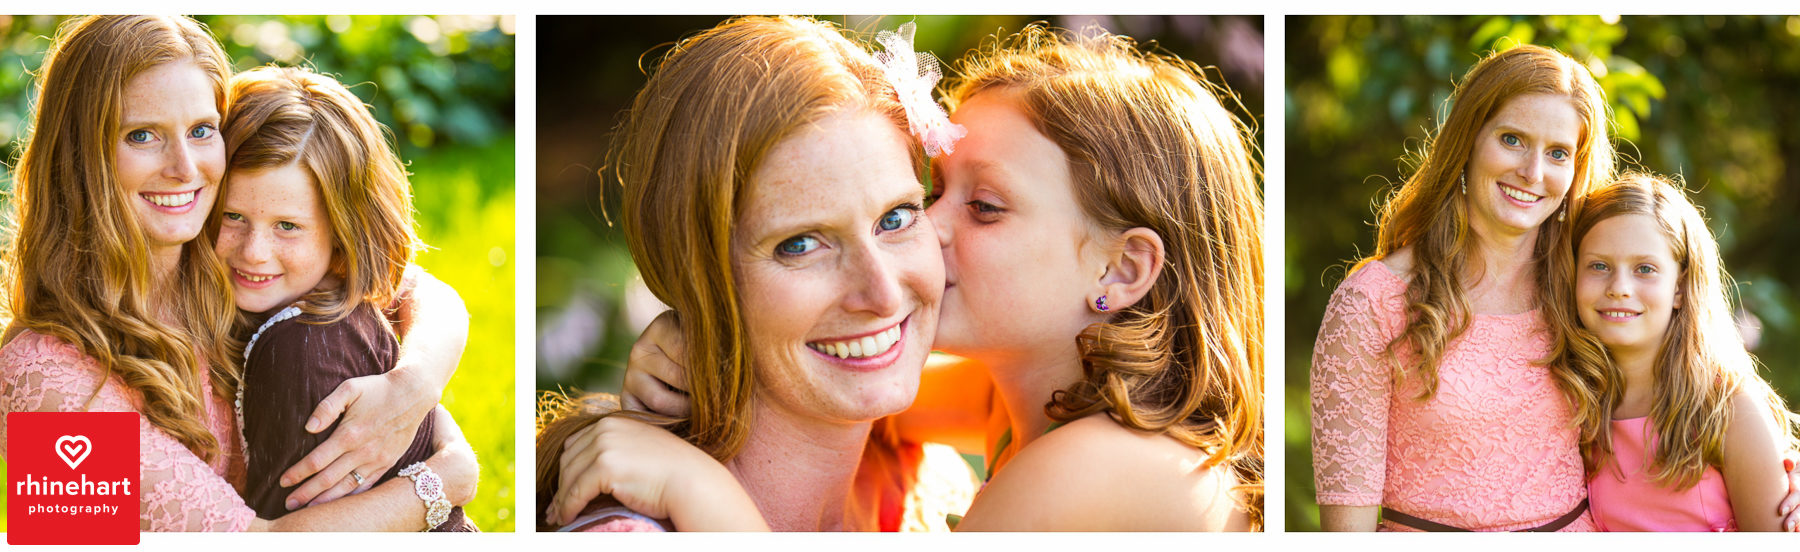 carlisle-family-portrait-photographer-30